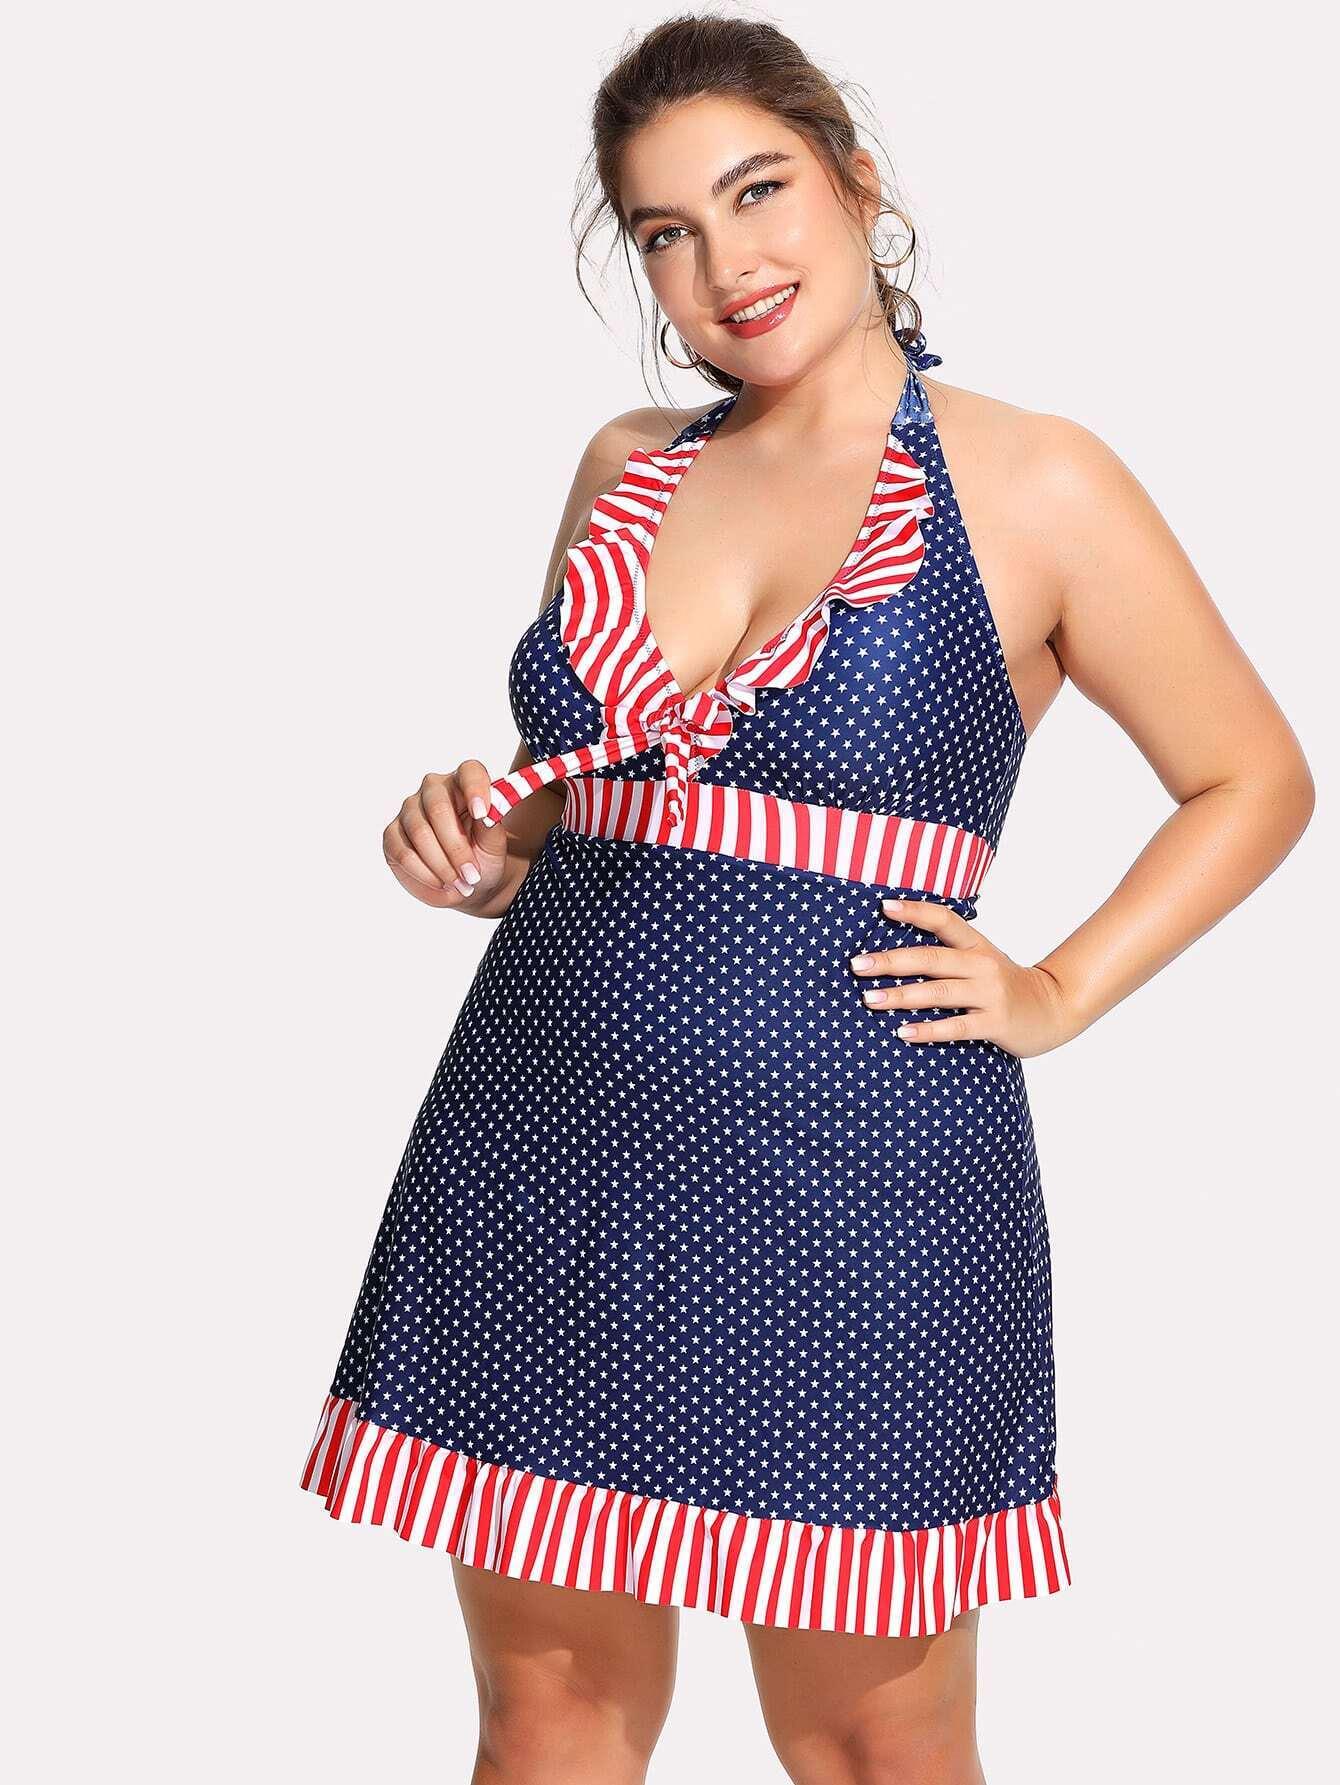 все цены на Polka Dot & Striped Print Skort Swim Dress